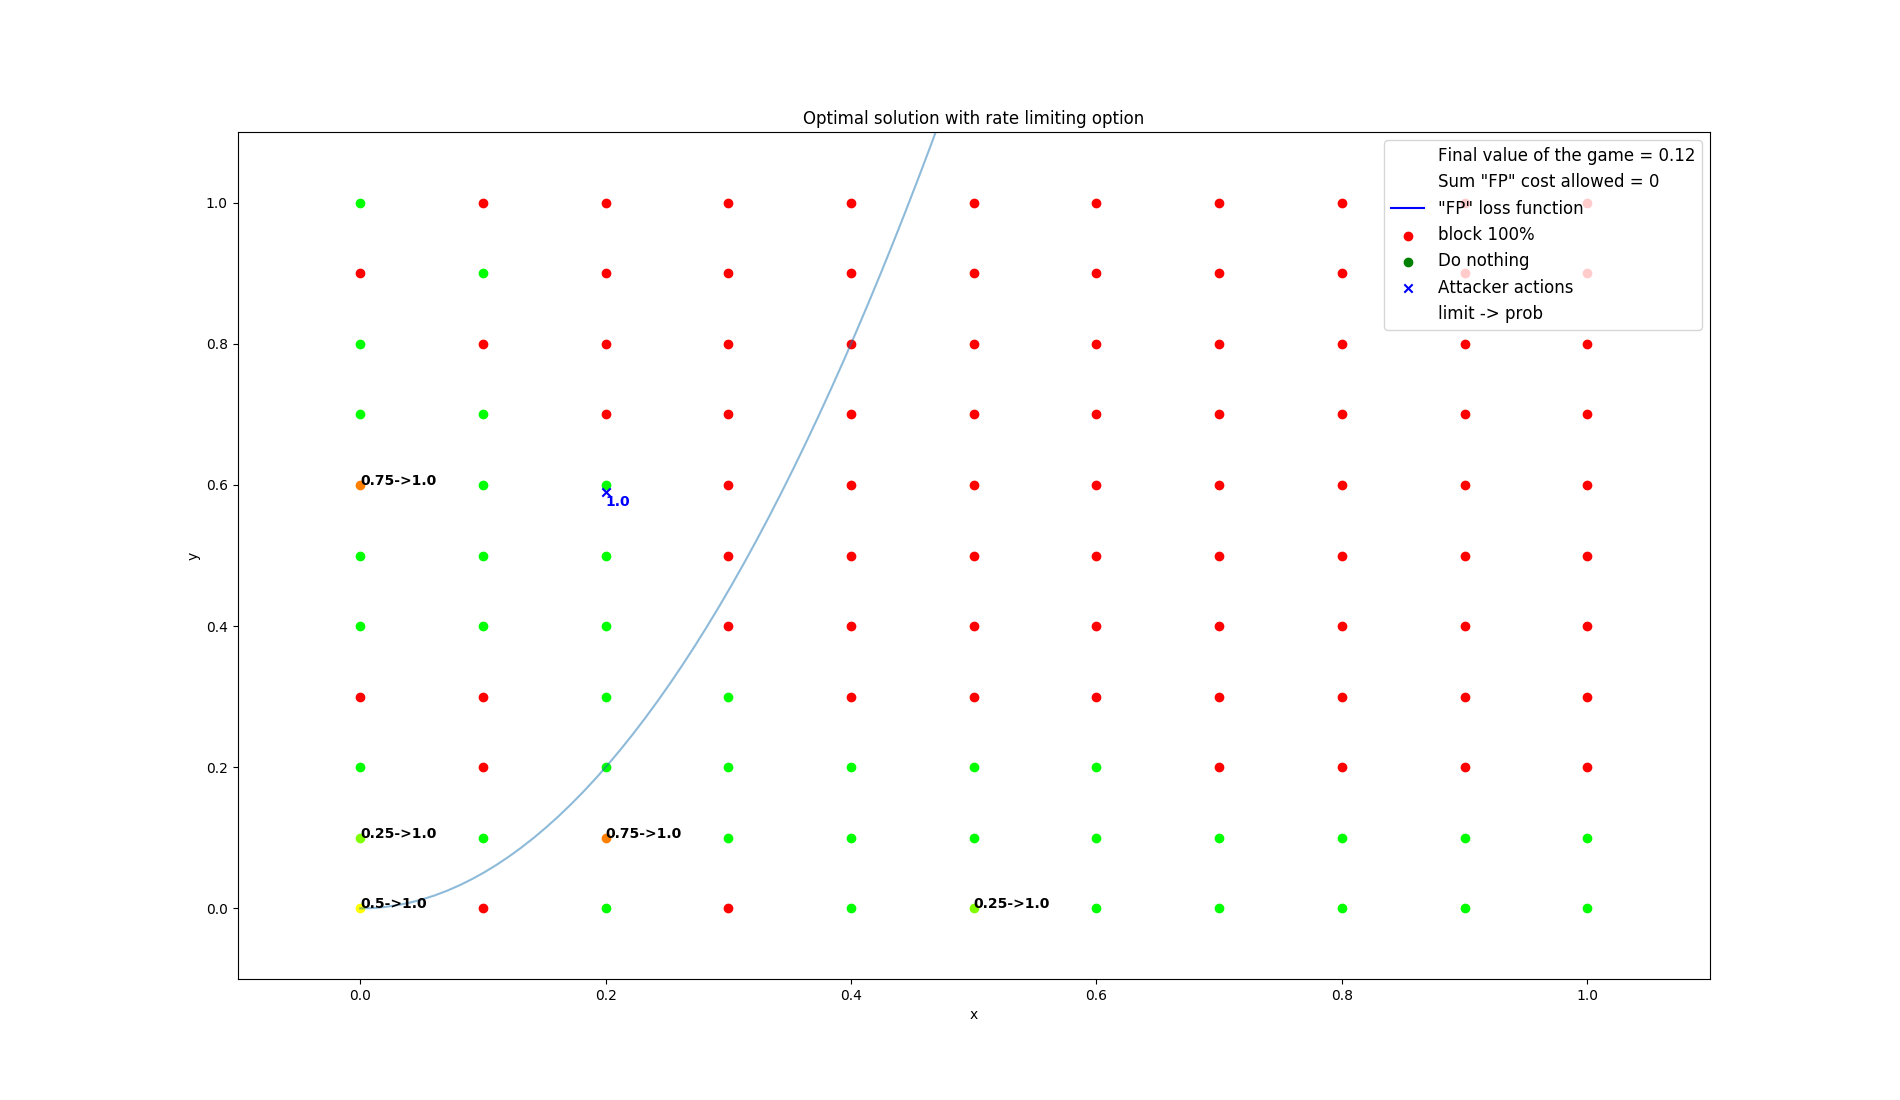 results/optimal/false_positive_constraint/3-summarization.png